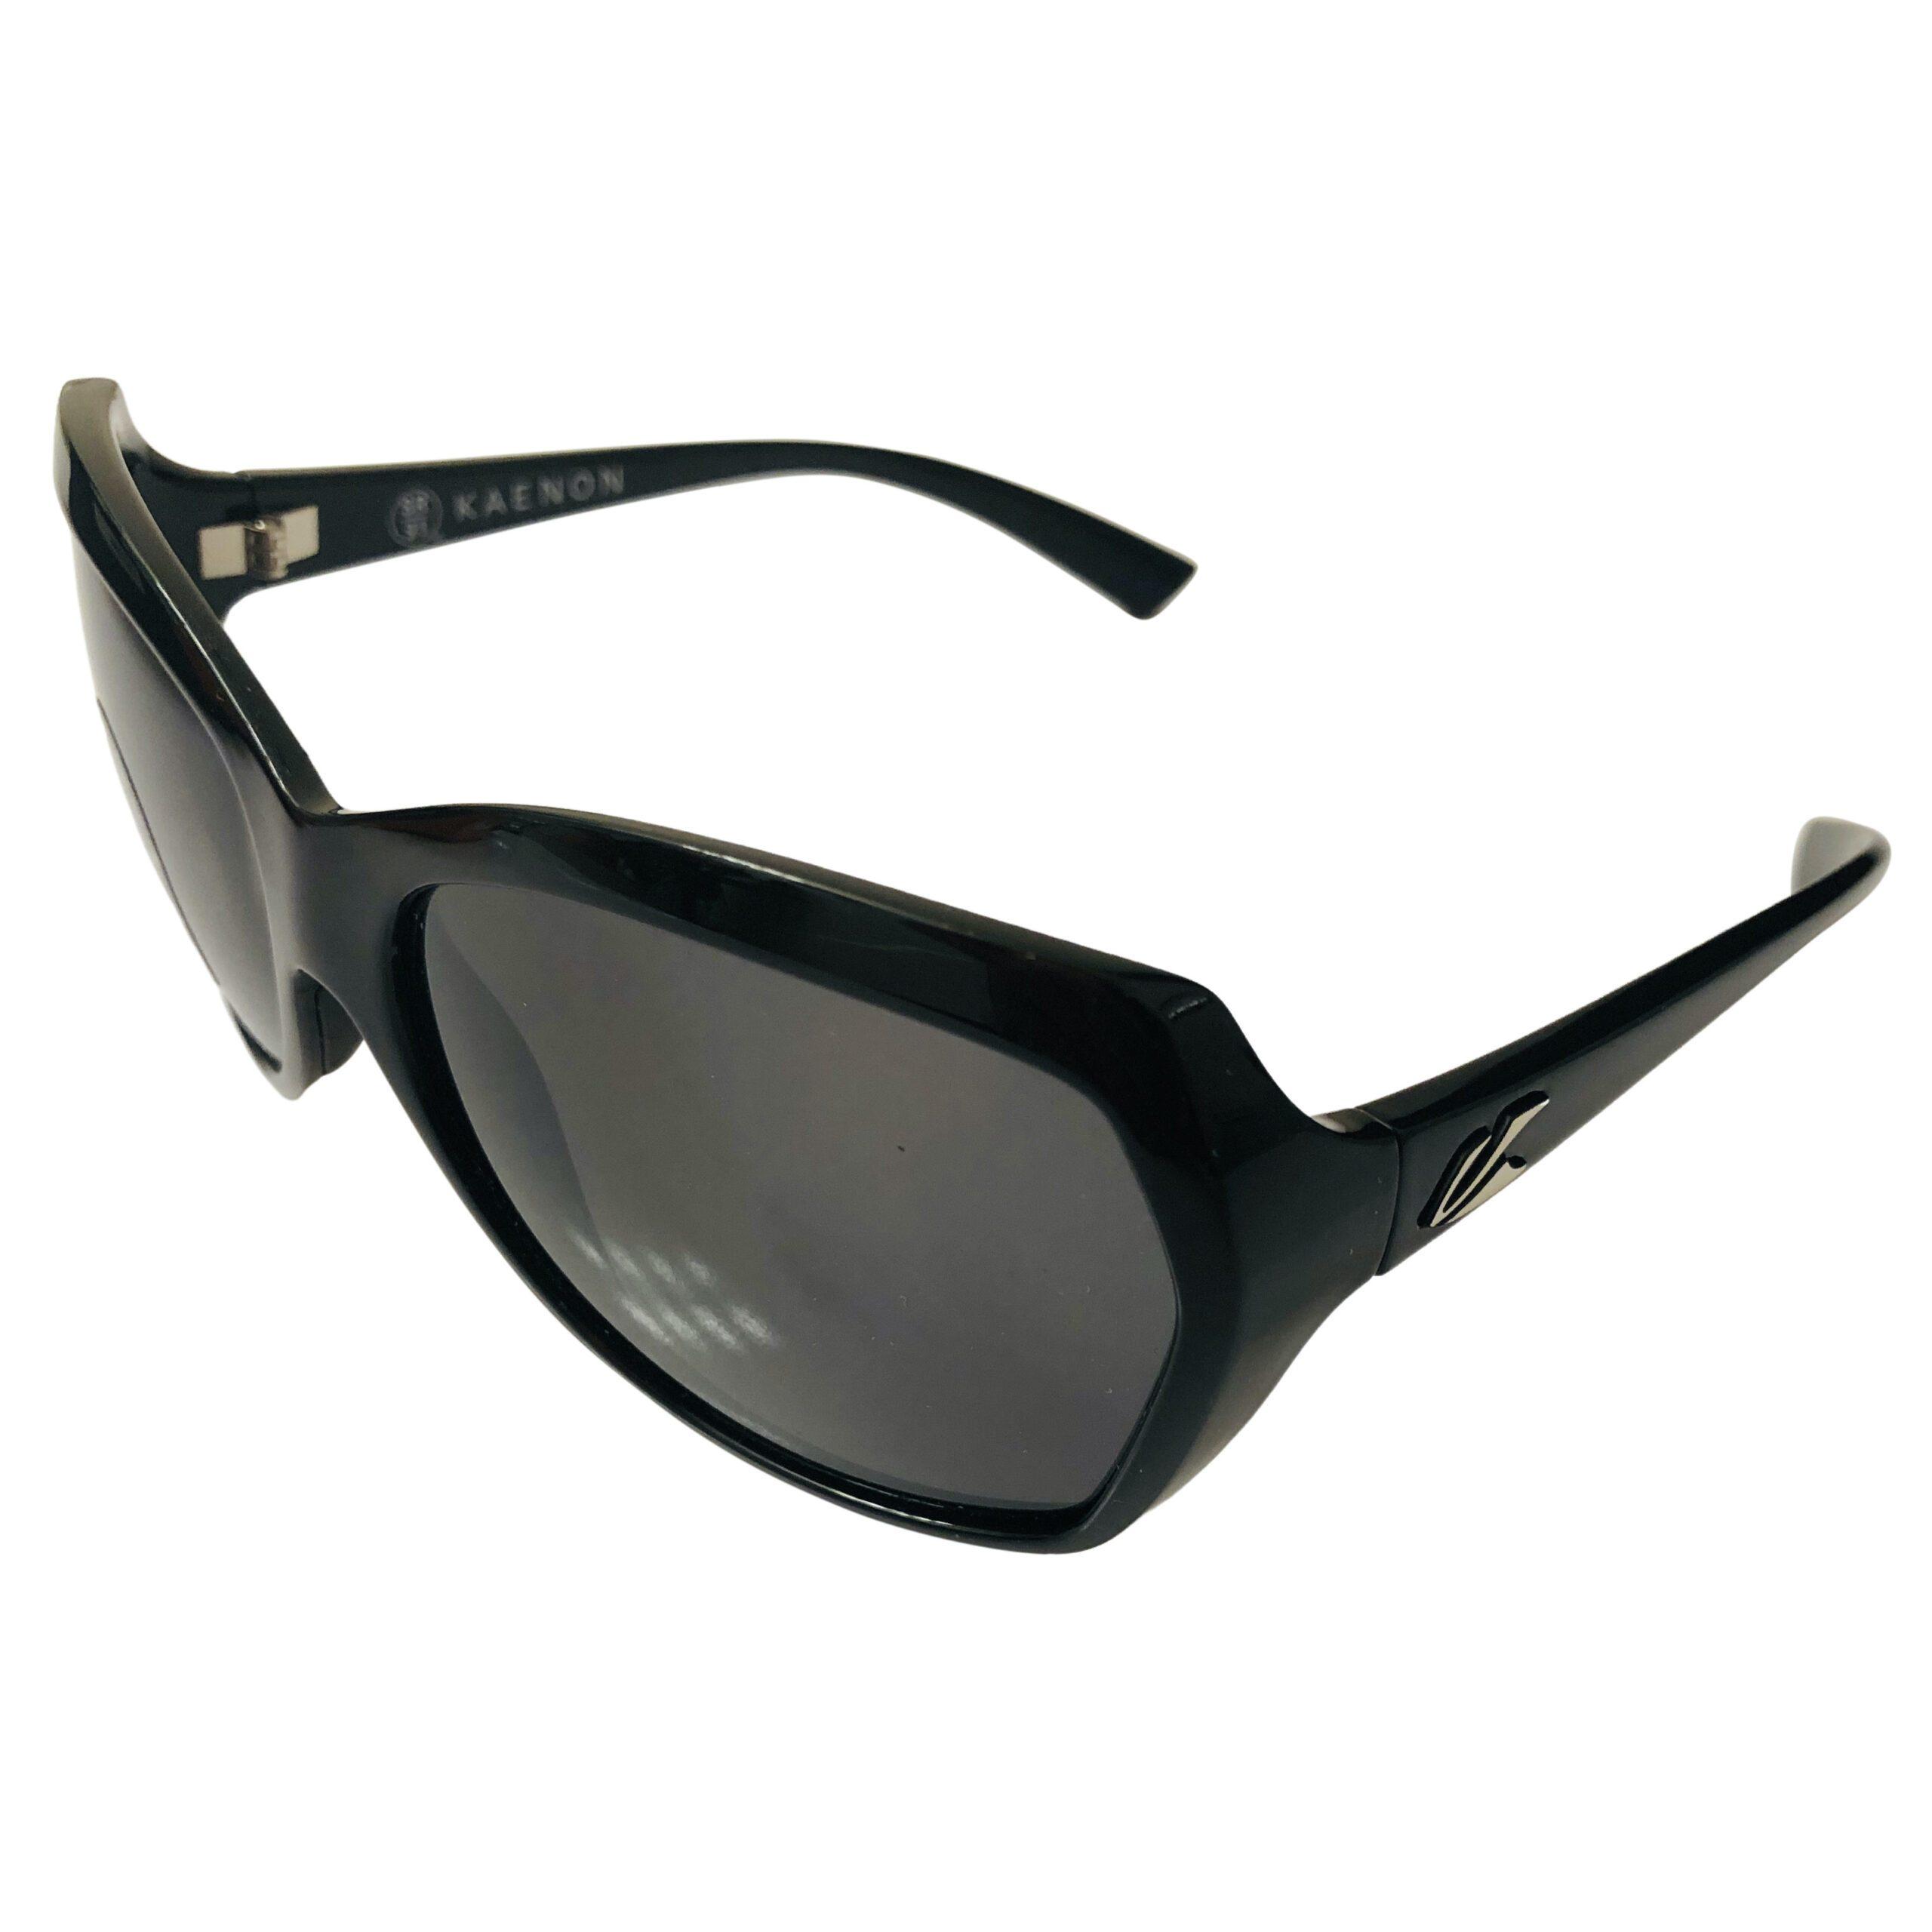 Kaenon Shilo Sunglasses - Black Frame POLARIZED Gray G12 SR-91 Lenses